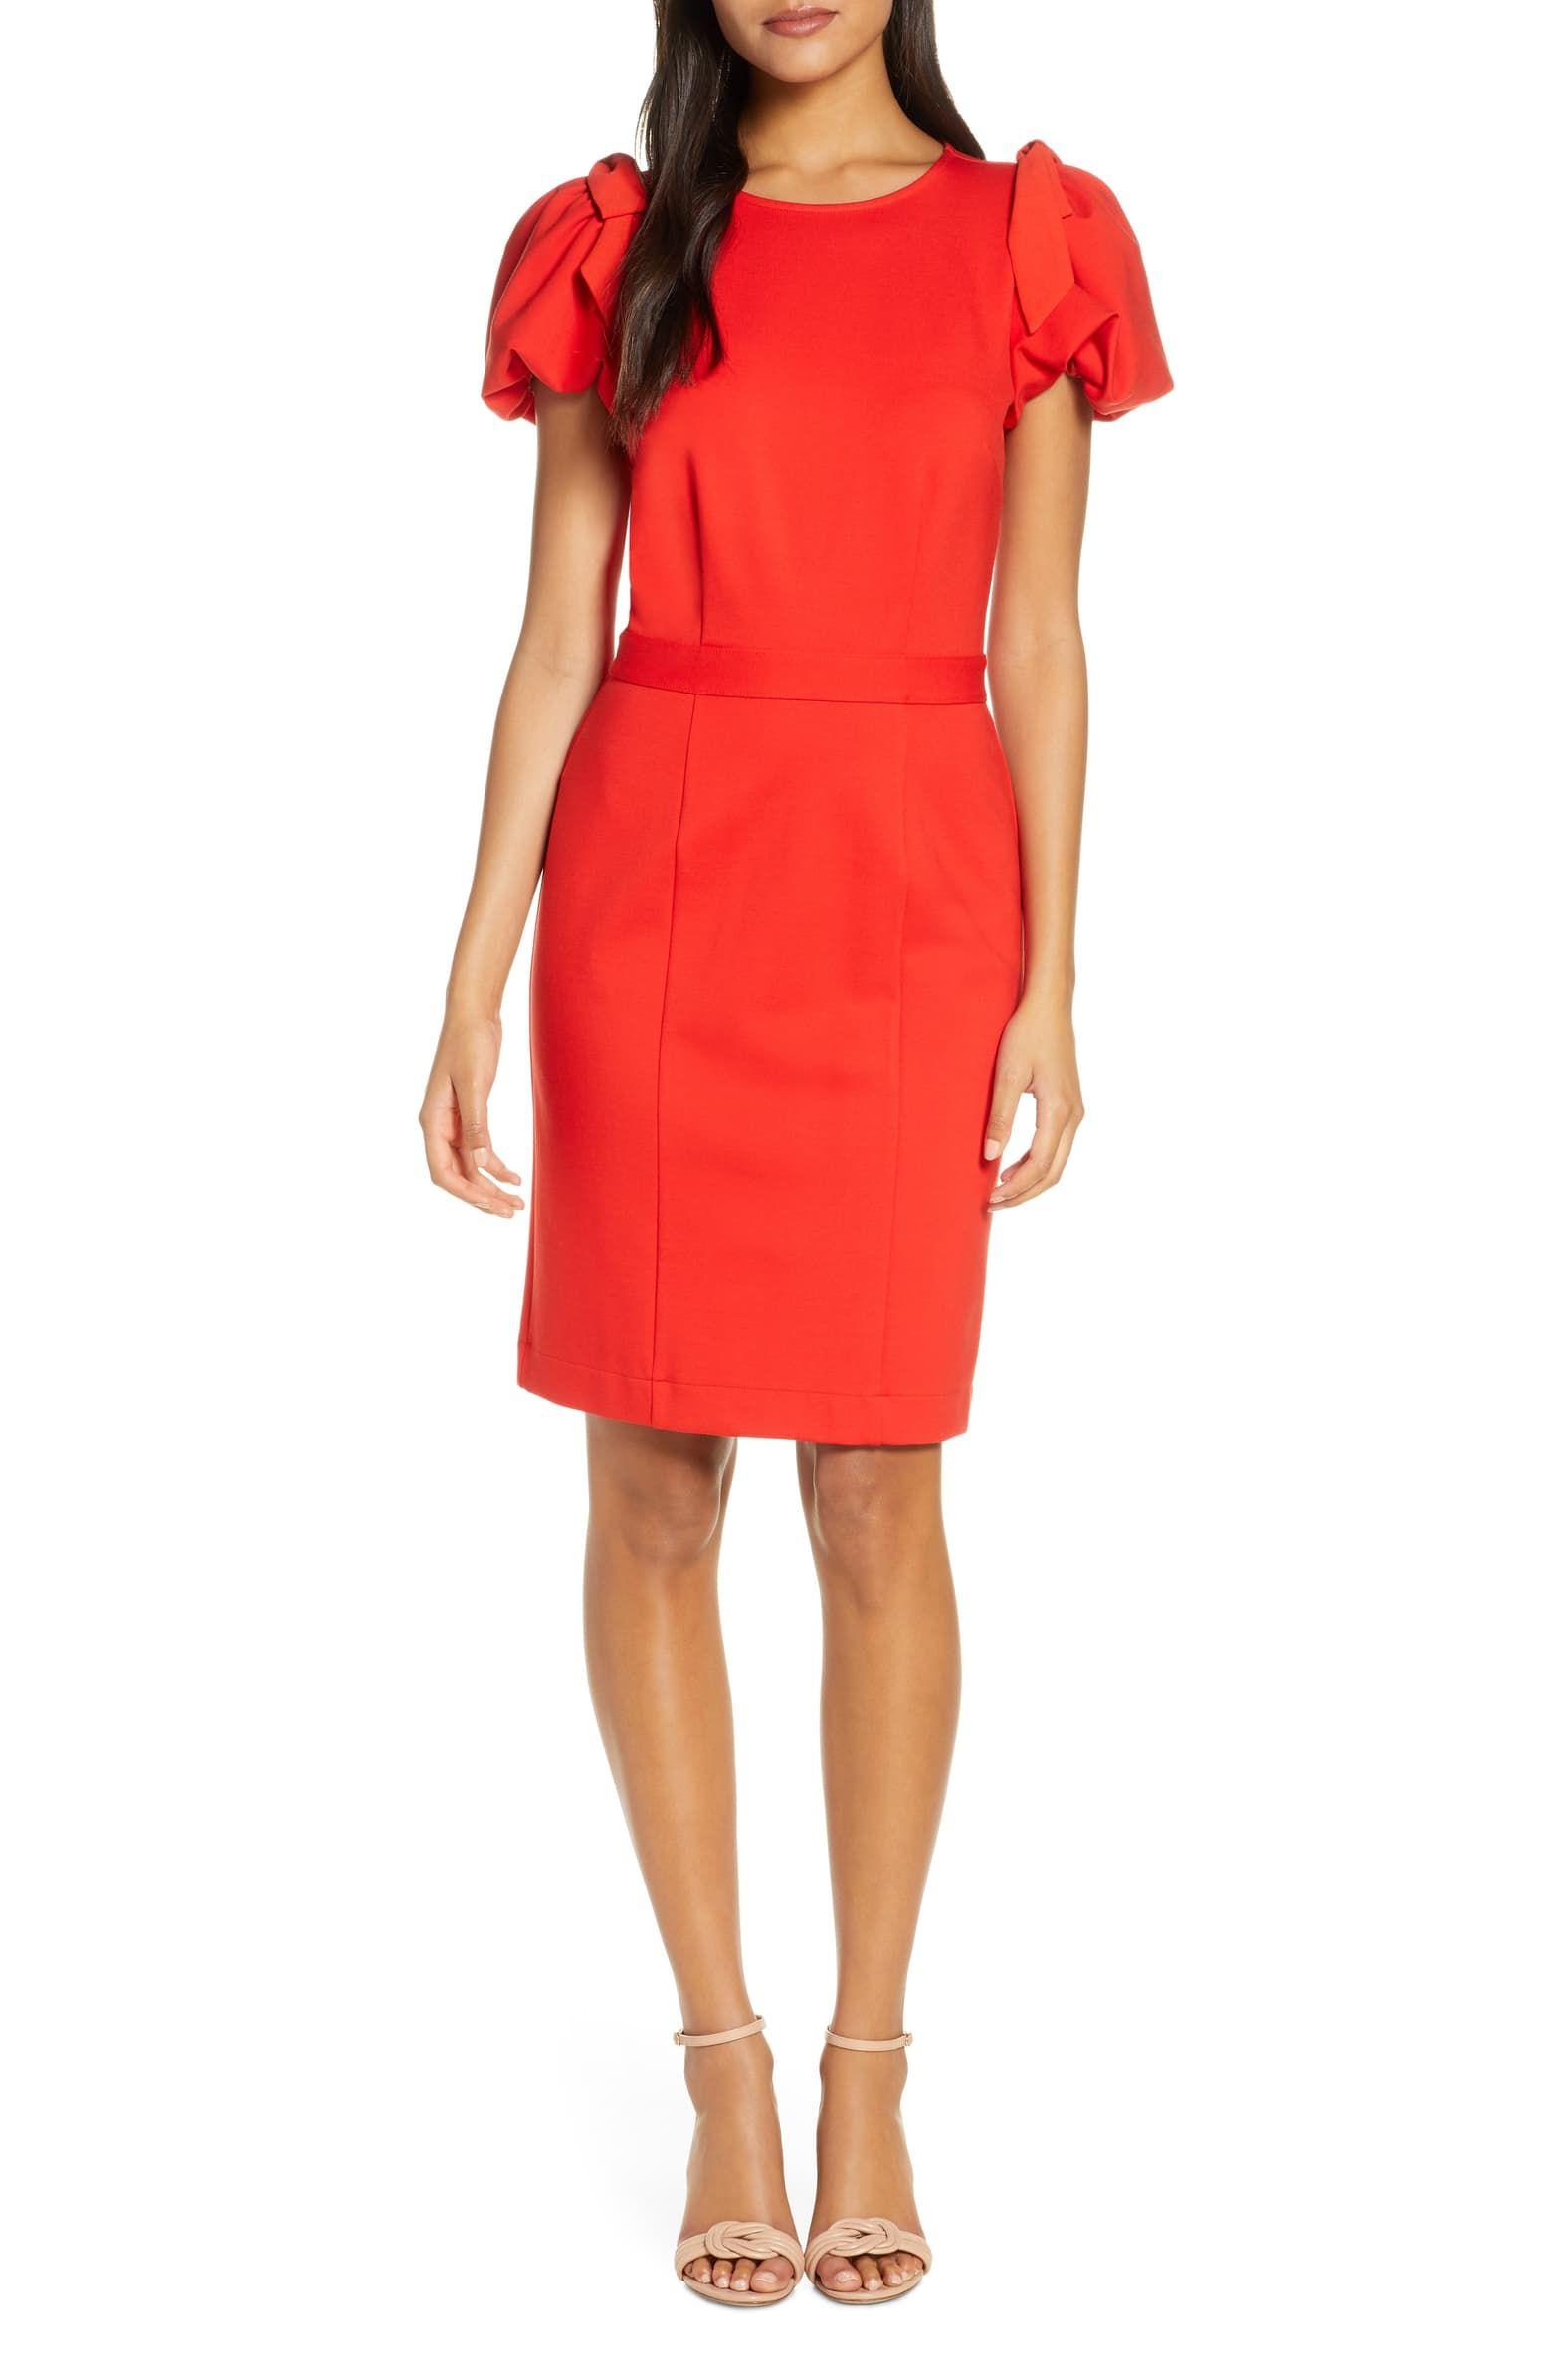 Rachel Parcell Bow Shoulder Detail Sheath Dress Nordstrom Exclusive Nordstrom Nordstrom Dresses Long Sleeve Wrap Midi Dress Valentines Day Dresses [ 2392 x 1560 Pixel ]